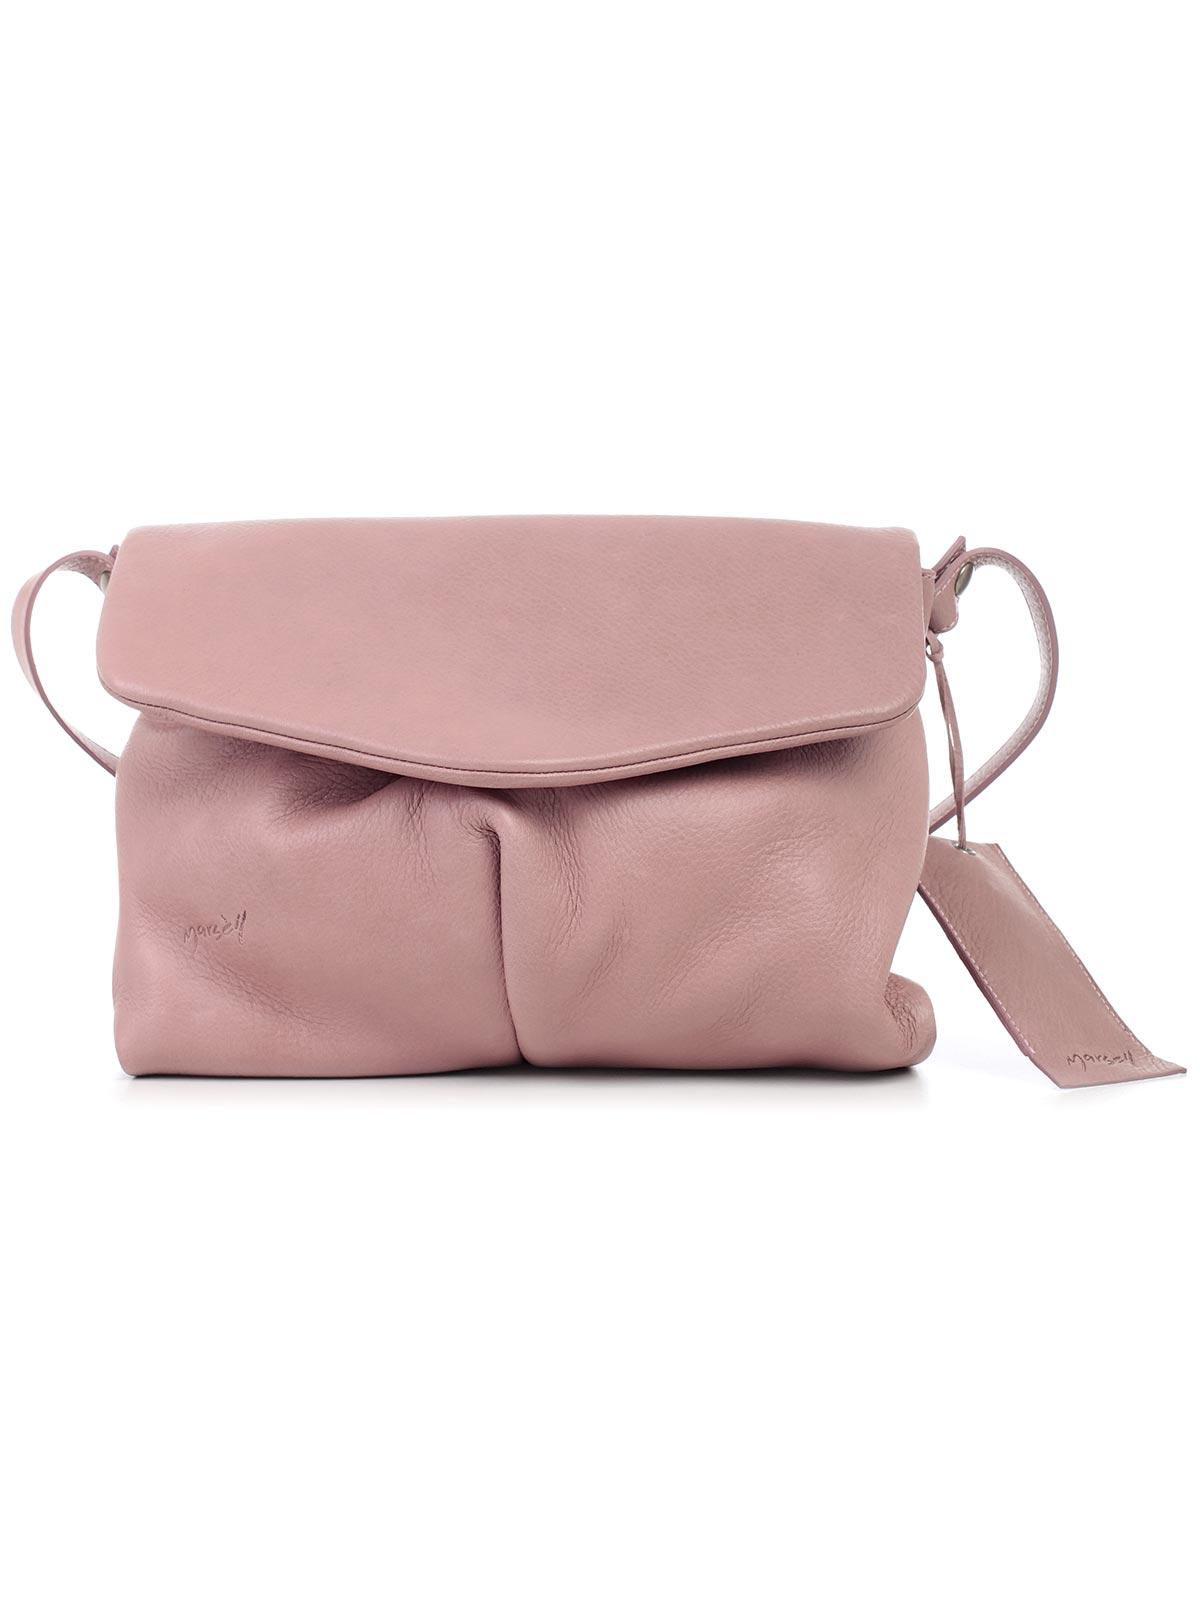 Picture of MARSELL Shoulder bag